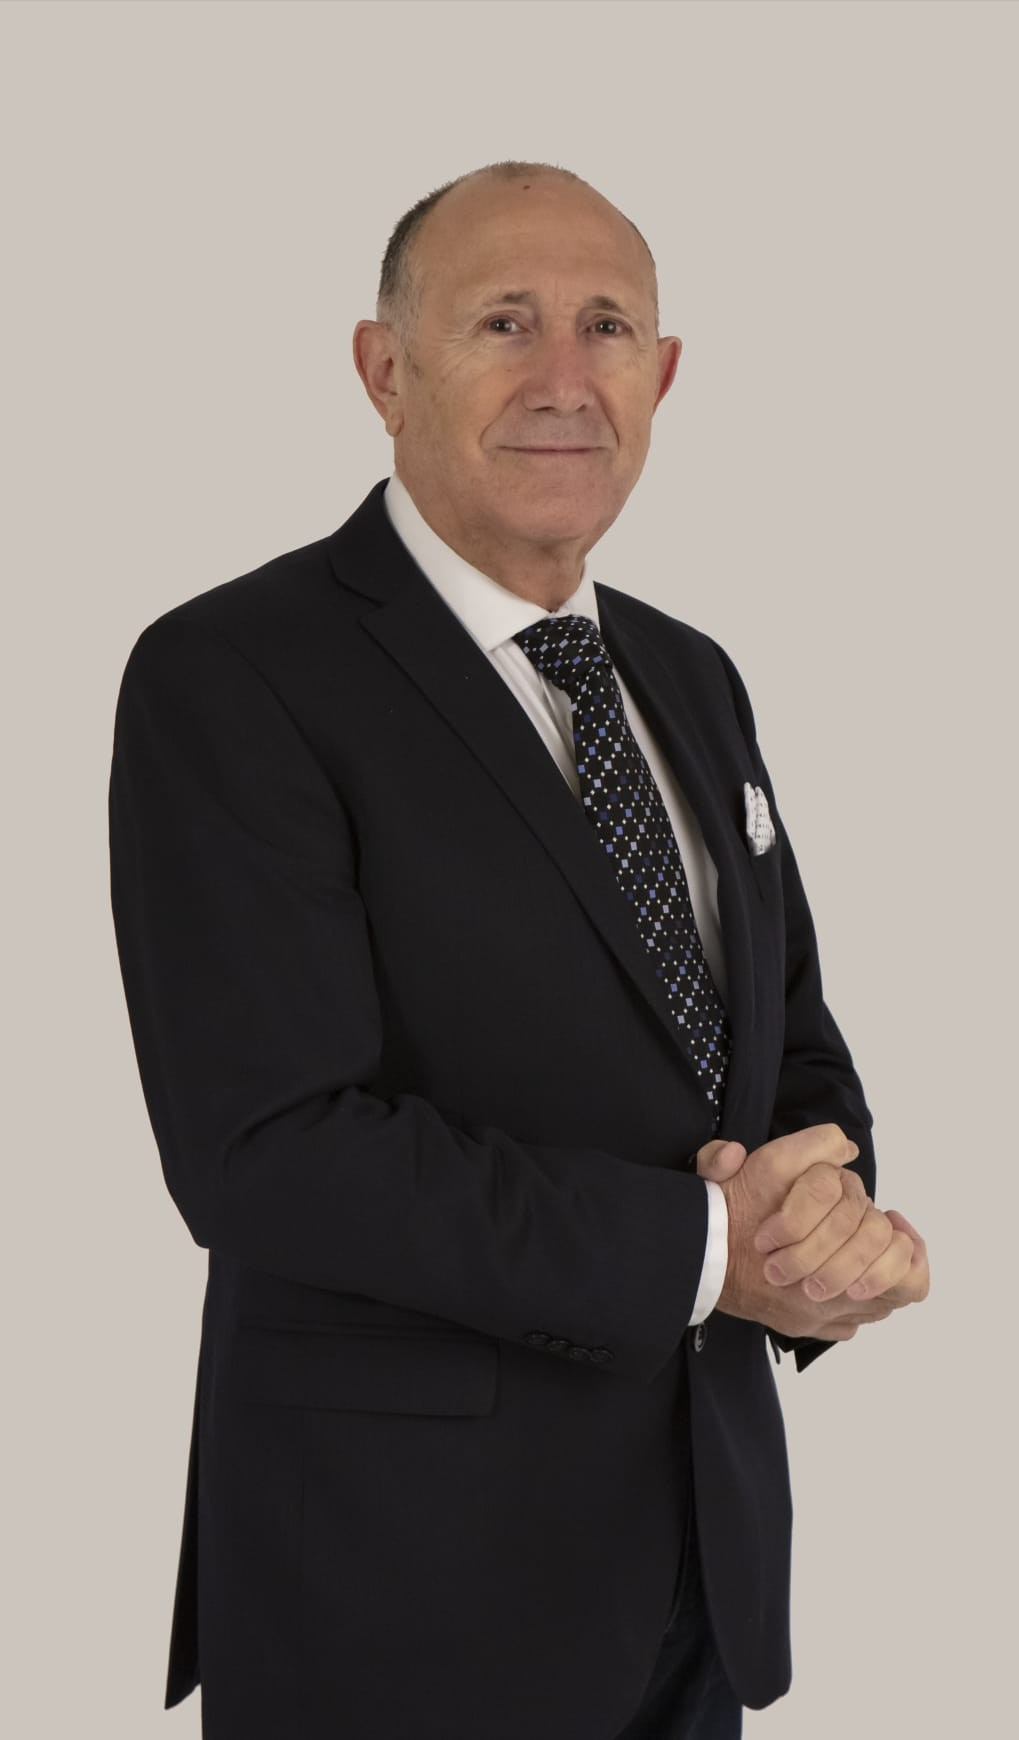 Fausto García Jimenez